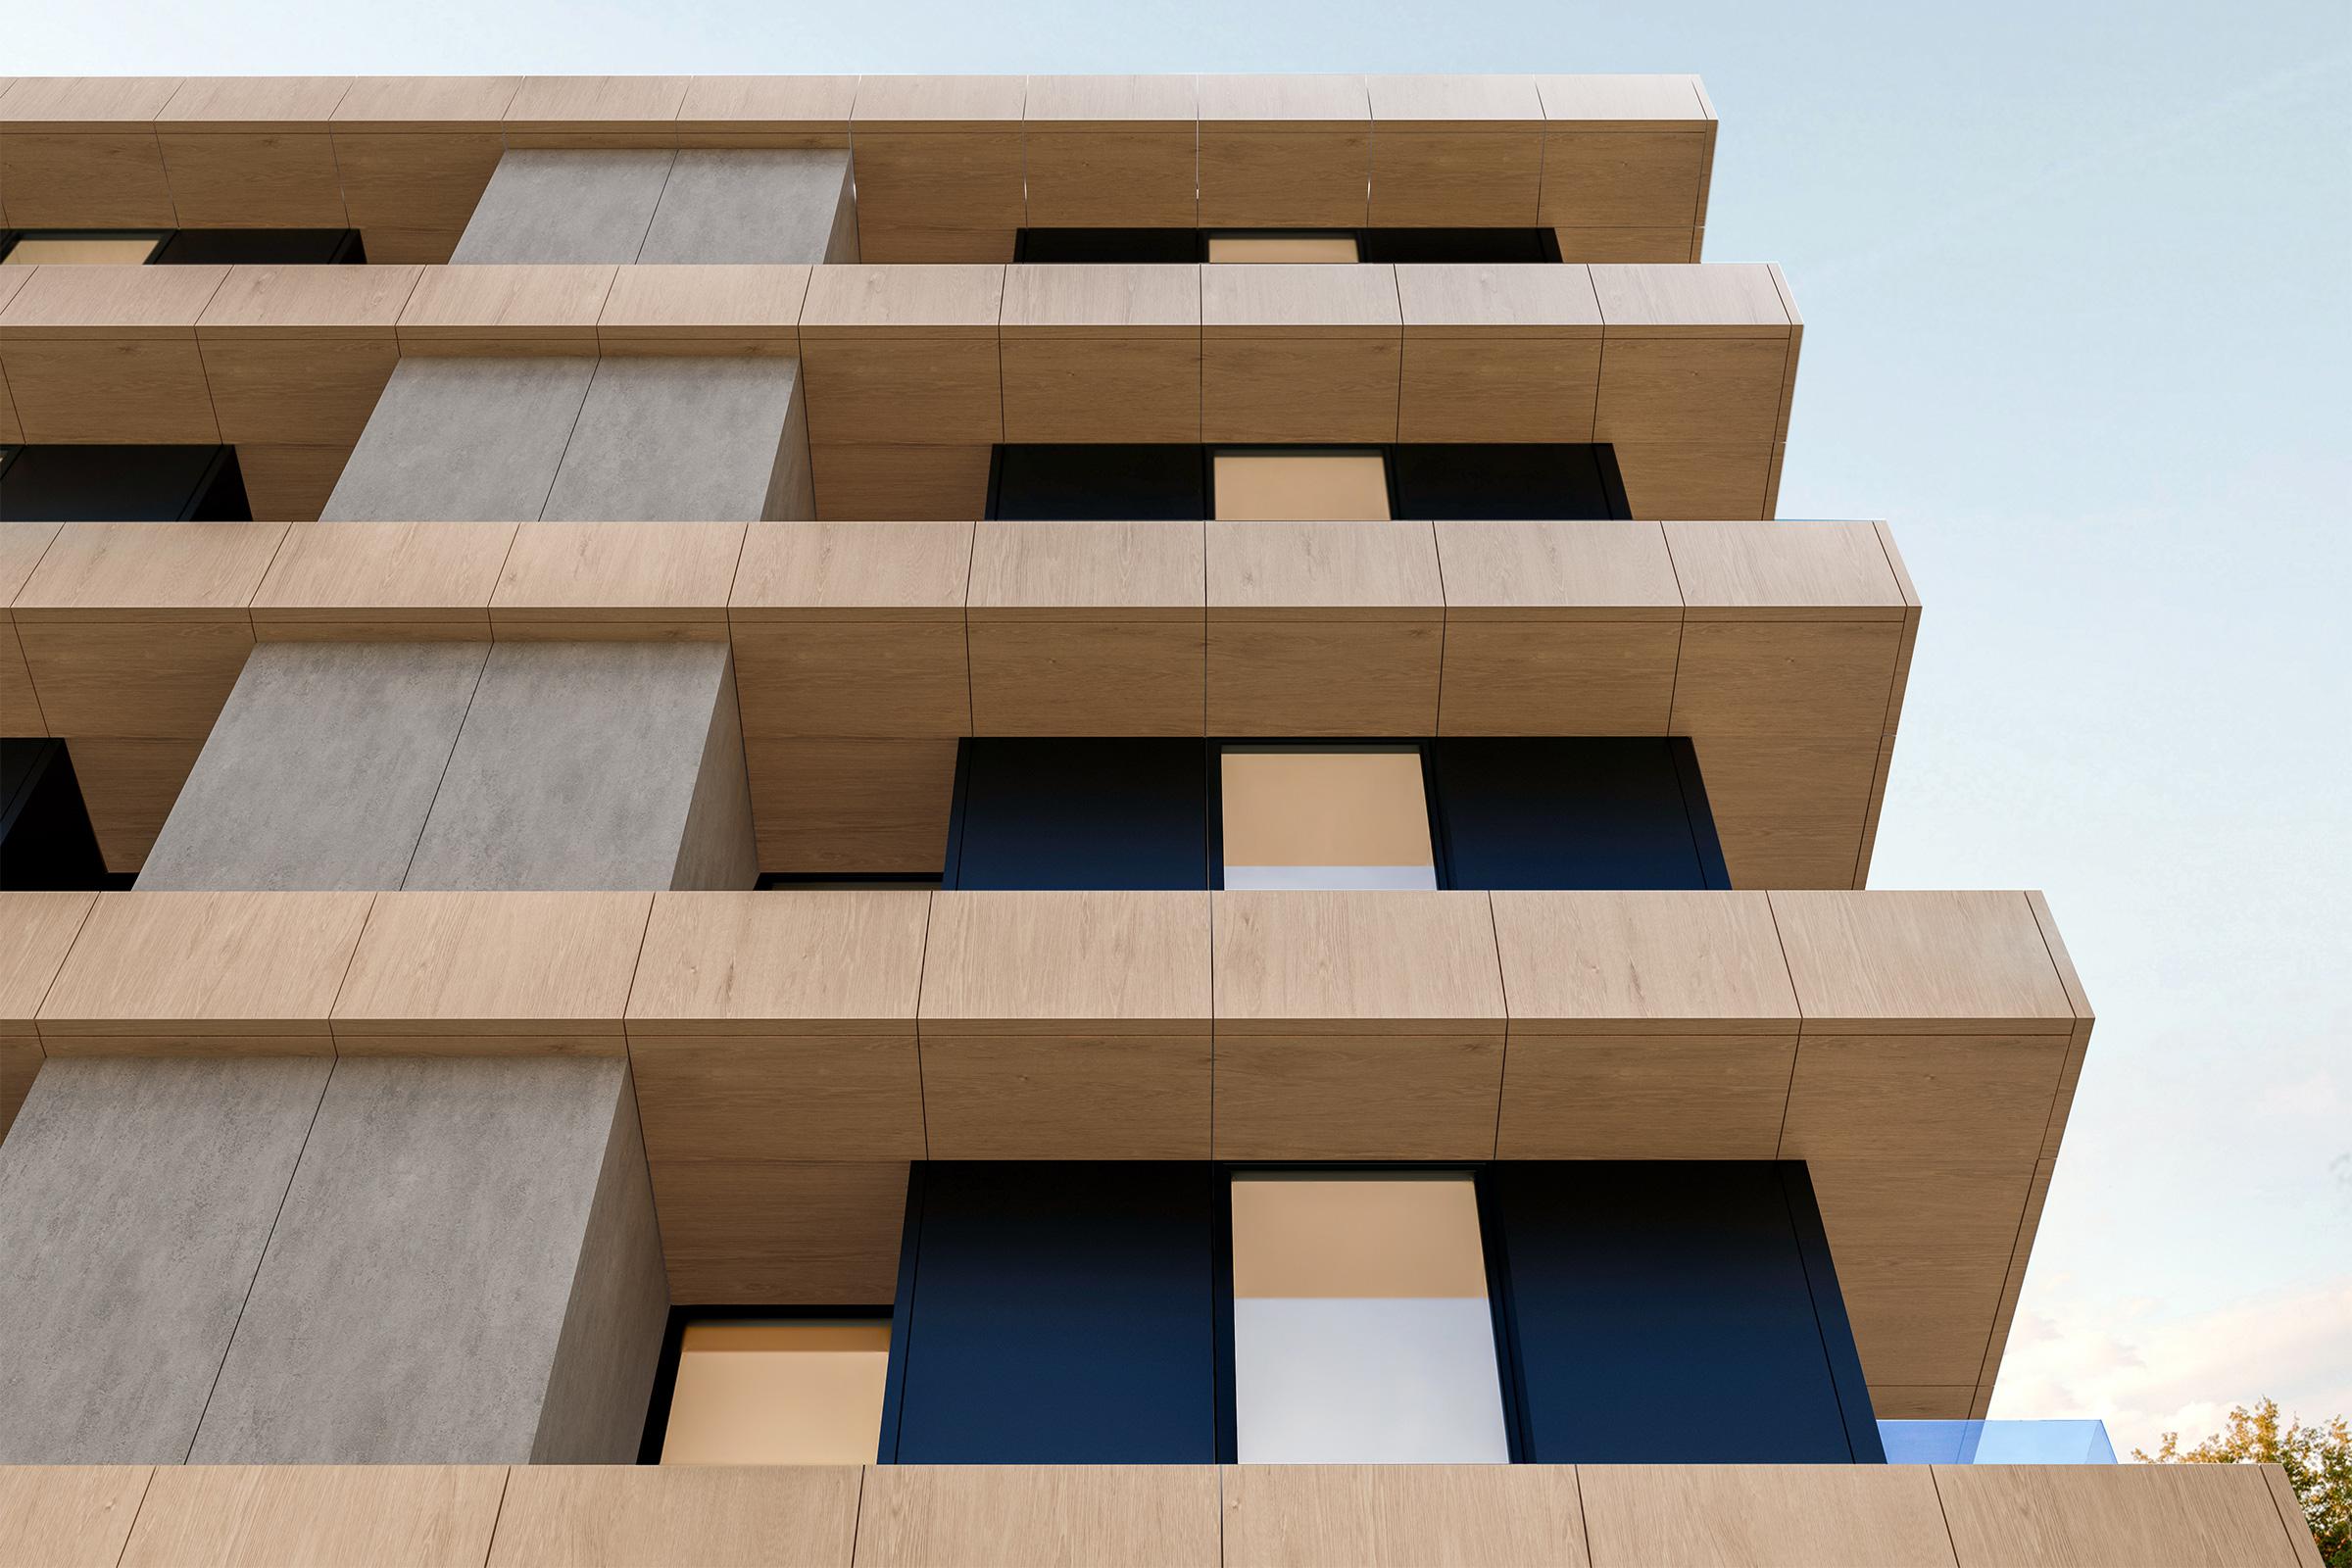 edificio-detallle-2_STB-W05